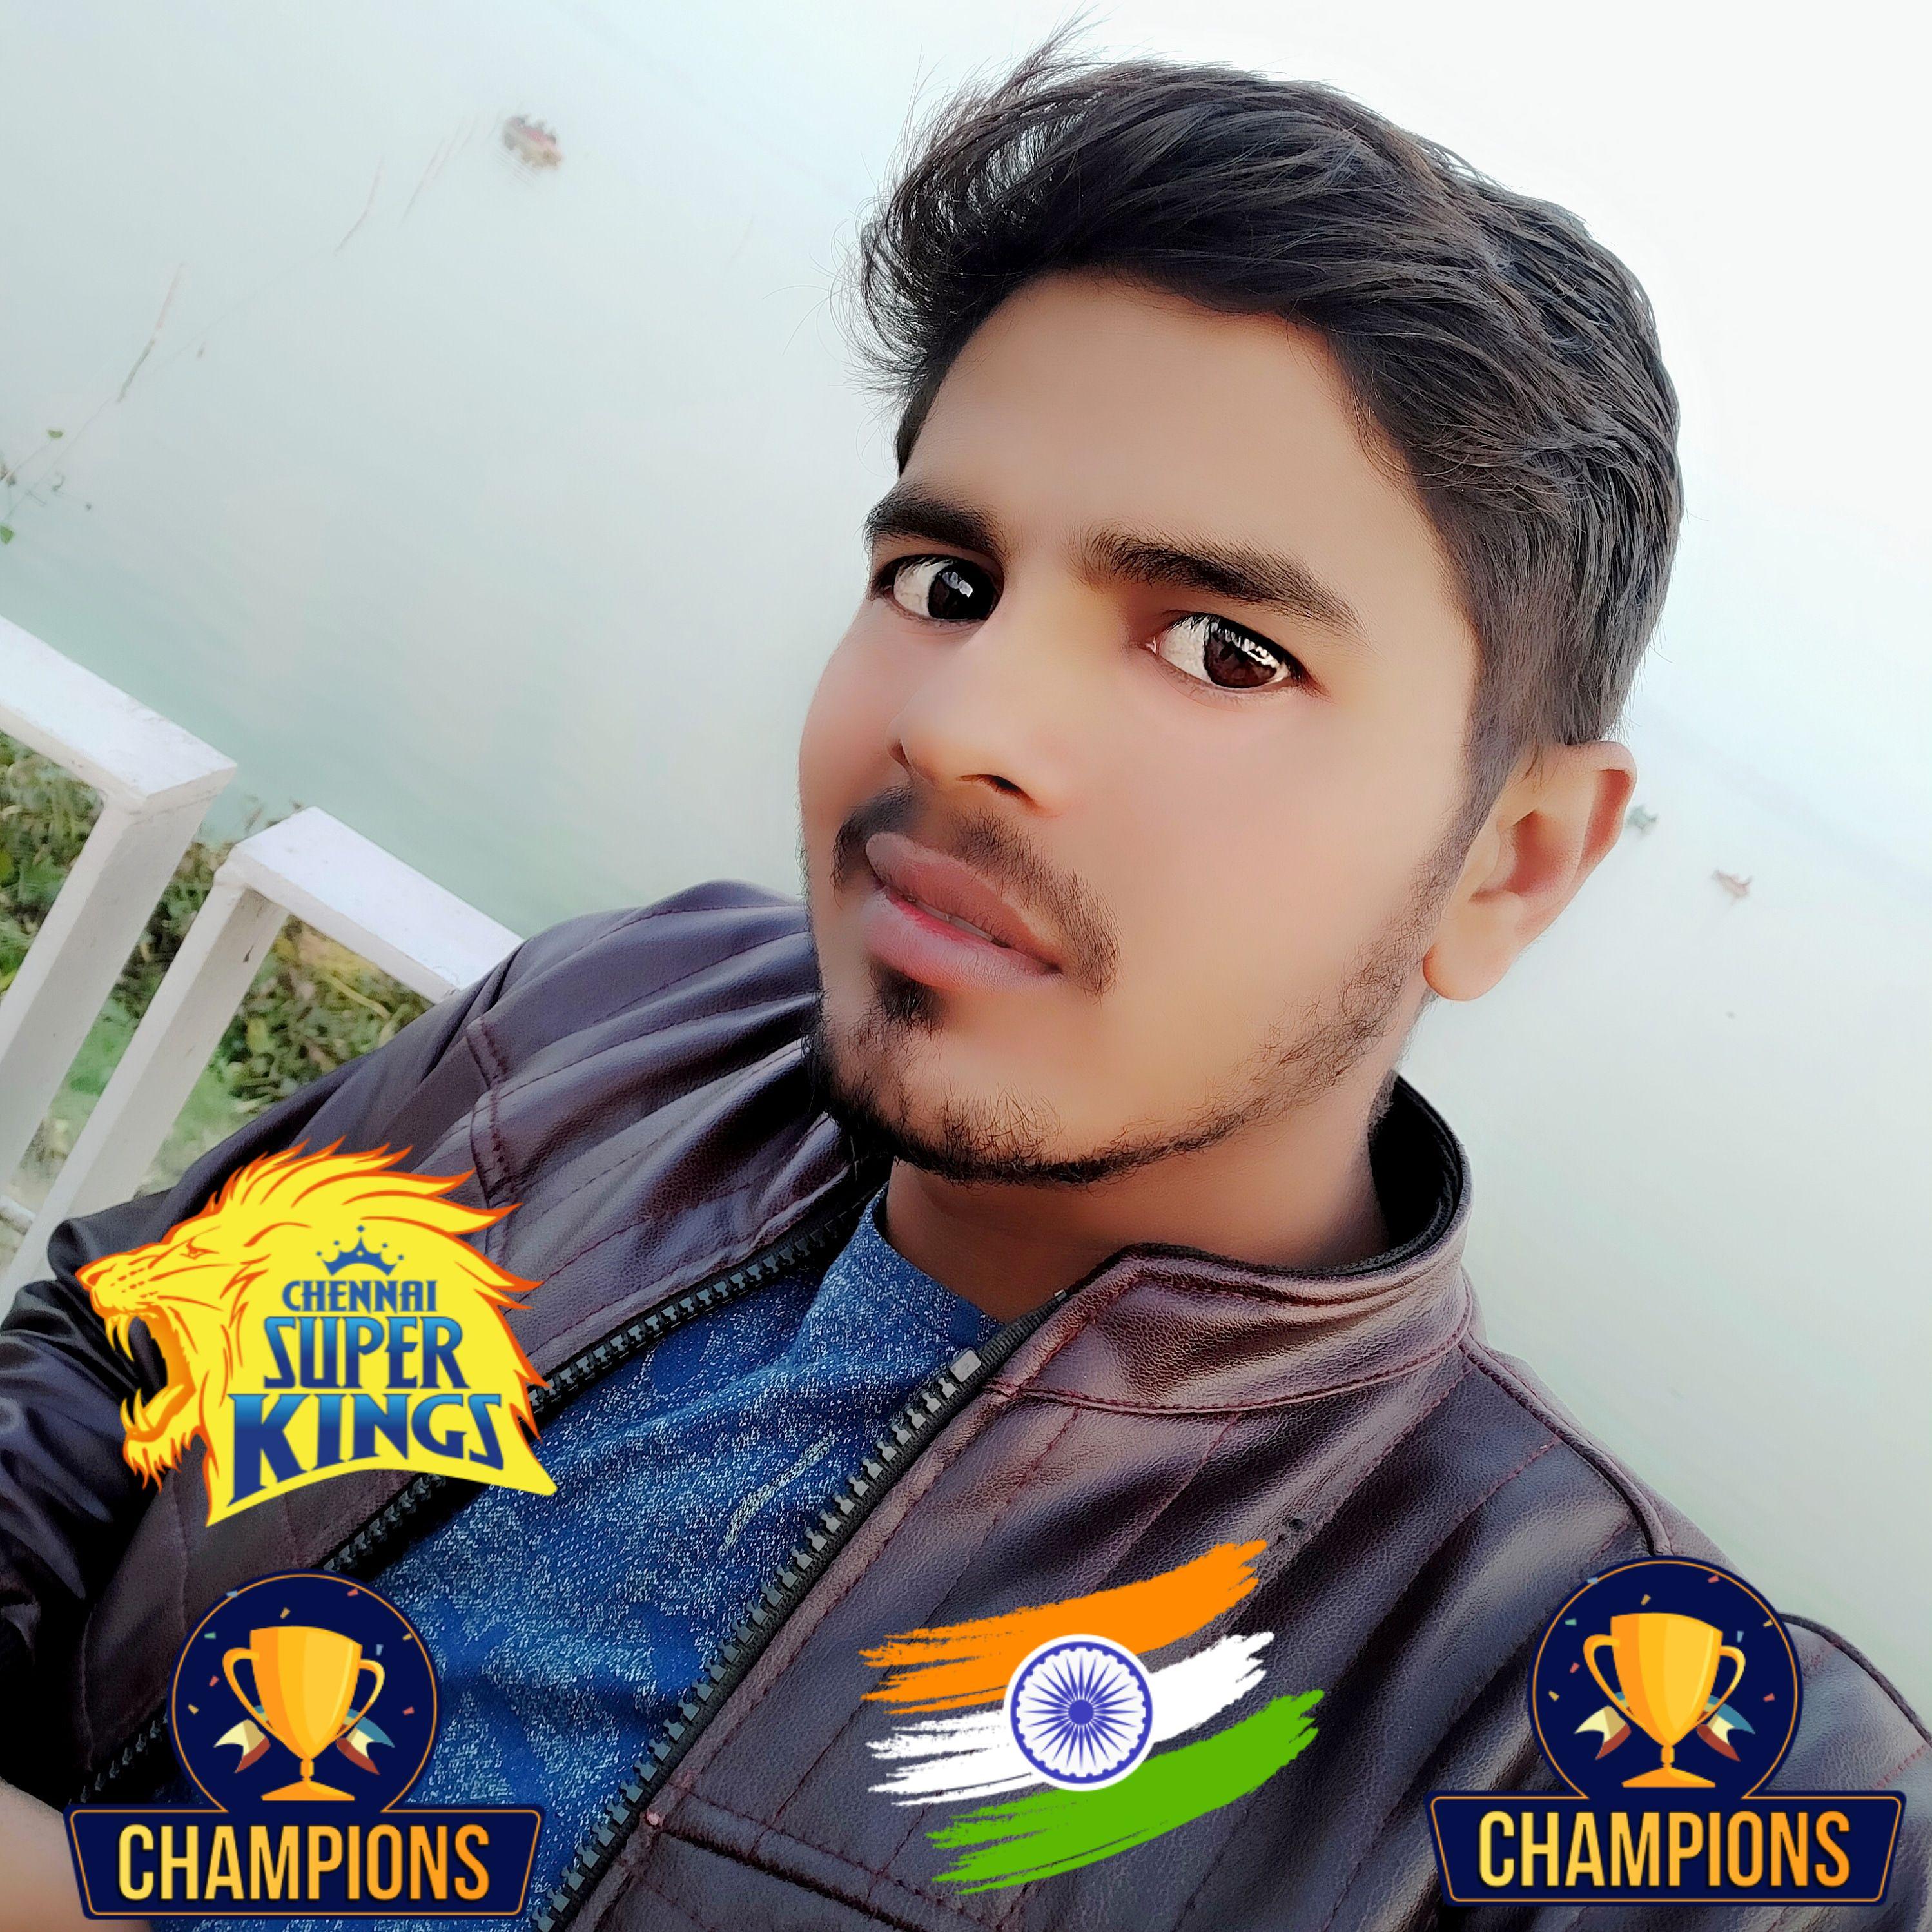 V Bazar photo 1